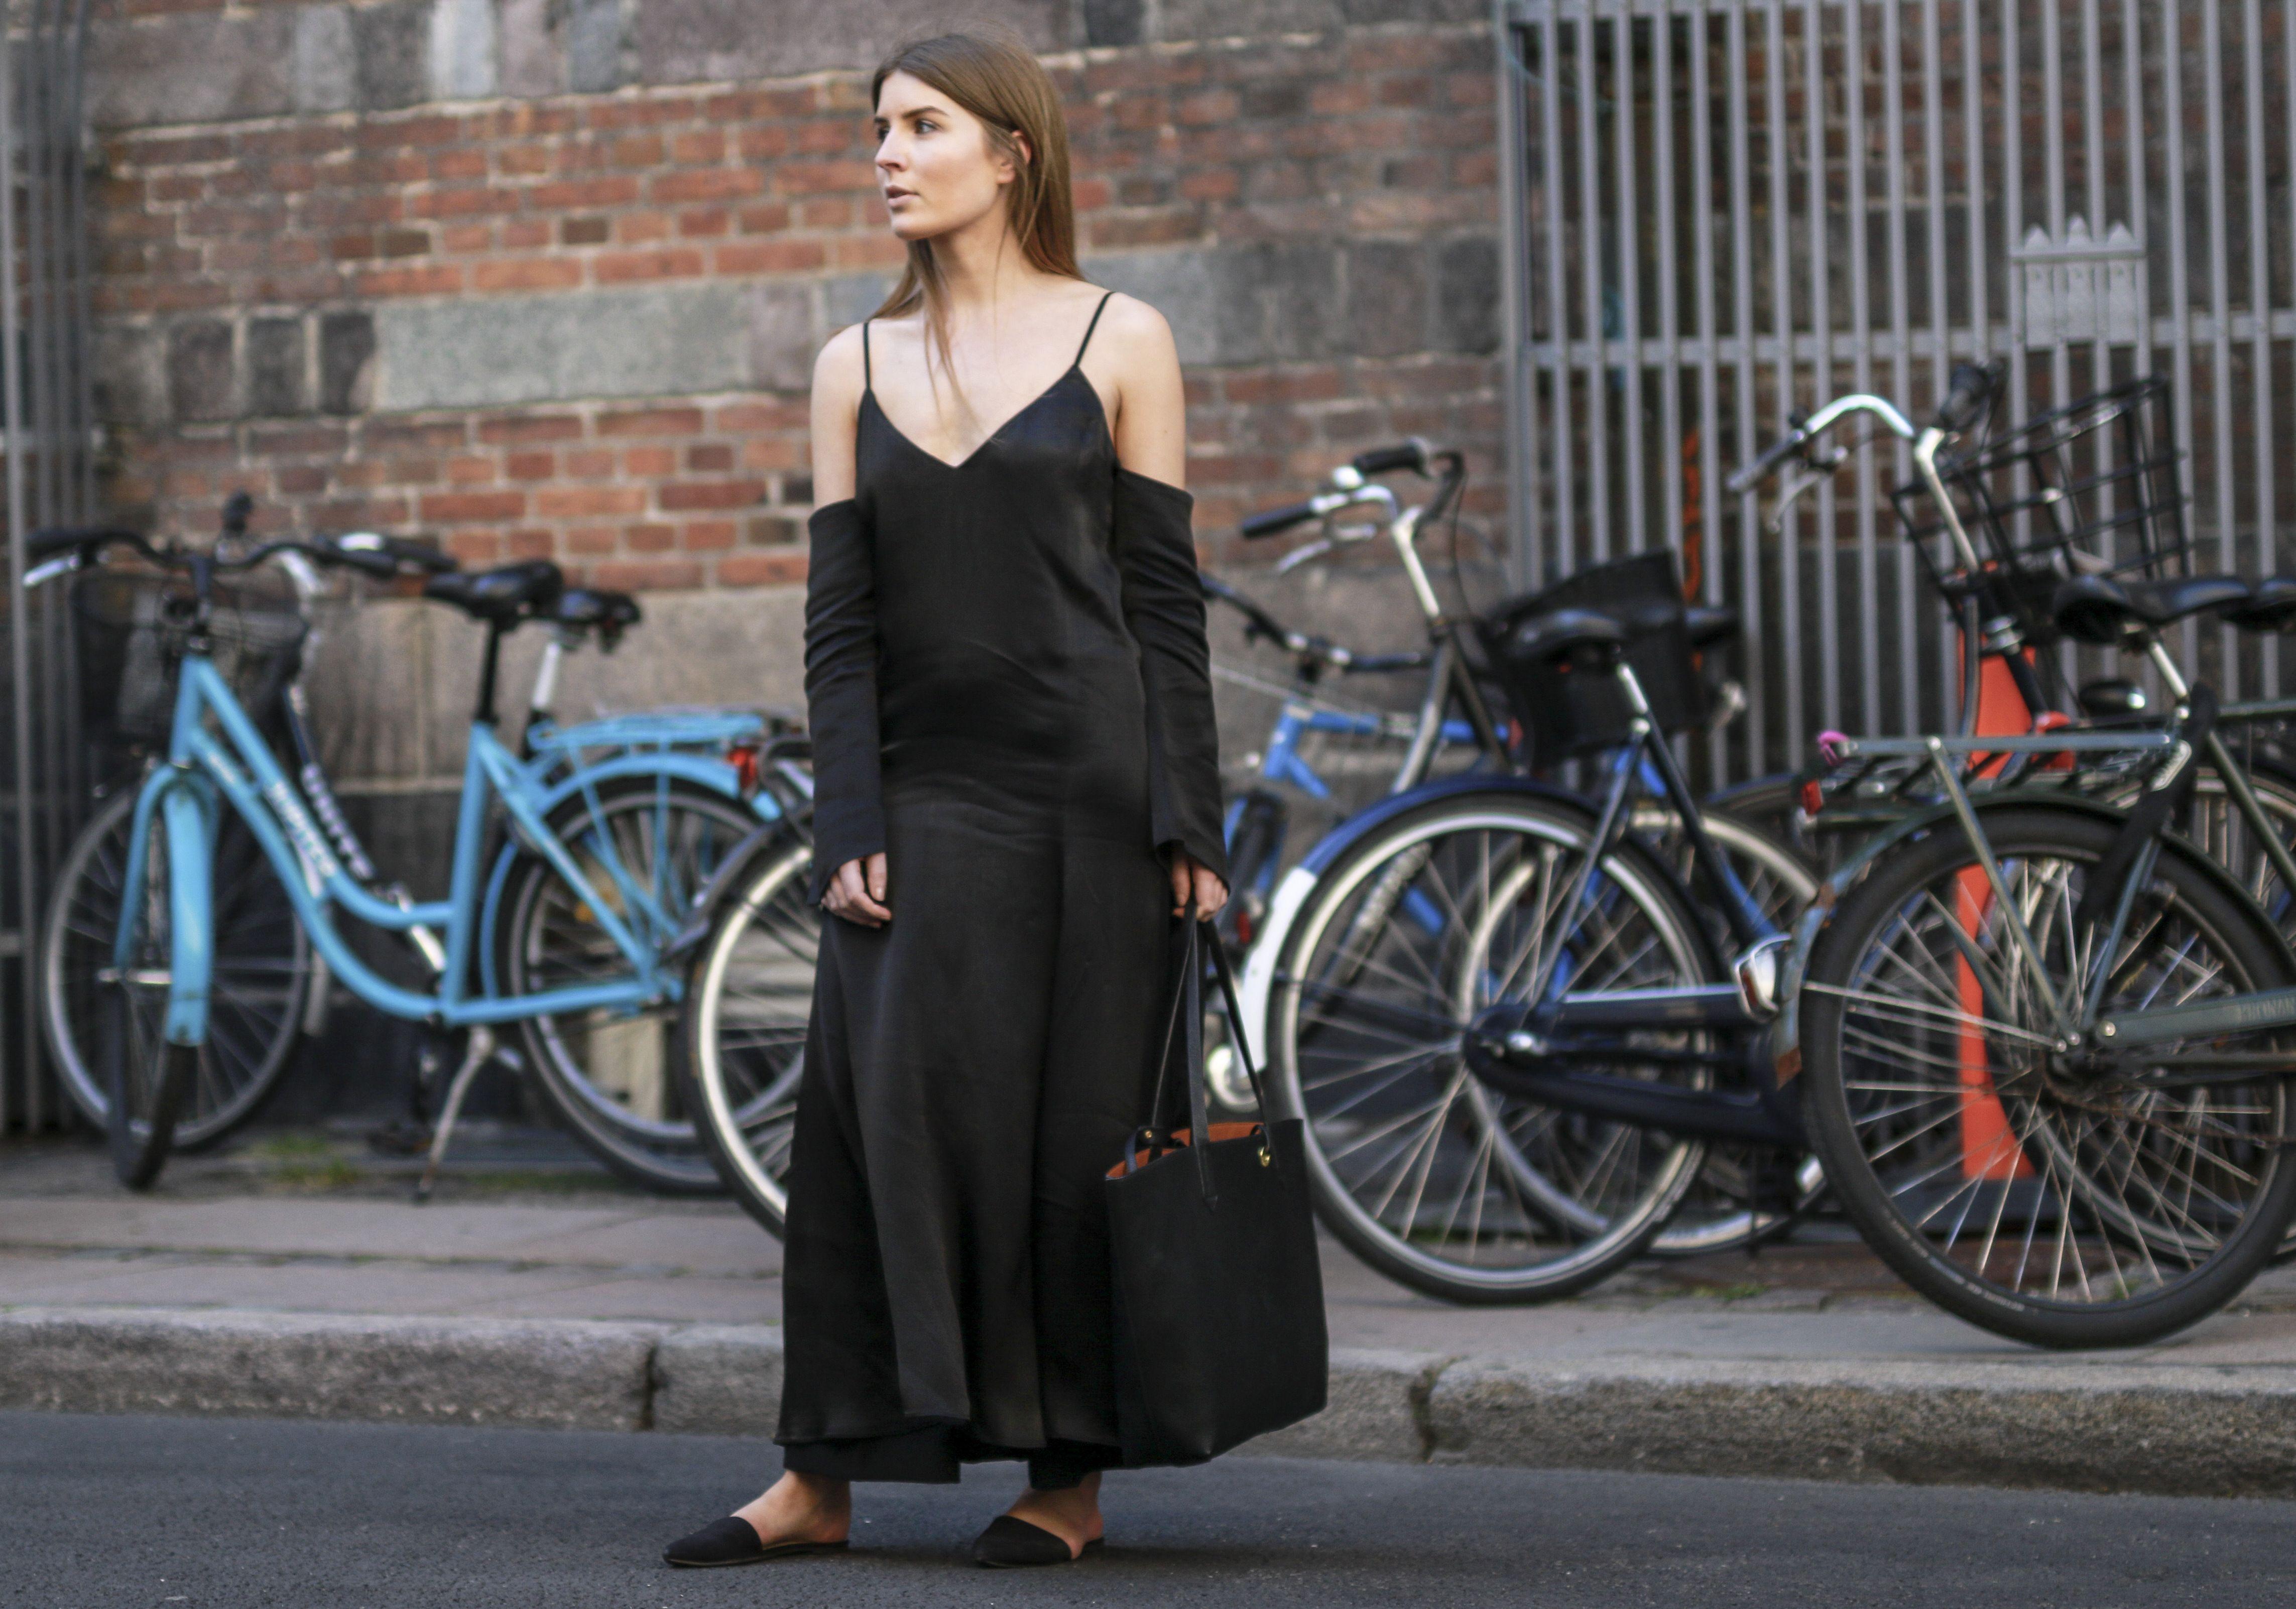 #streetstyle #fashion #streetfashion #street #mode #moda #copenhagen #lifestyle #woman #stylish #stylist #fashionable #fashionweek #shoes #bag #bloggers #blogger #fashionblogger #dress #black